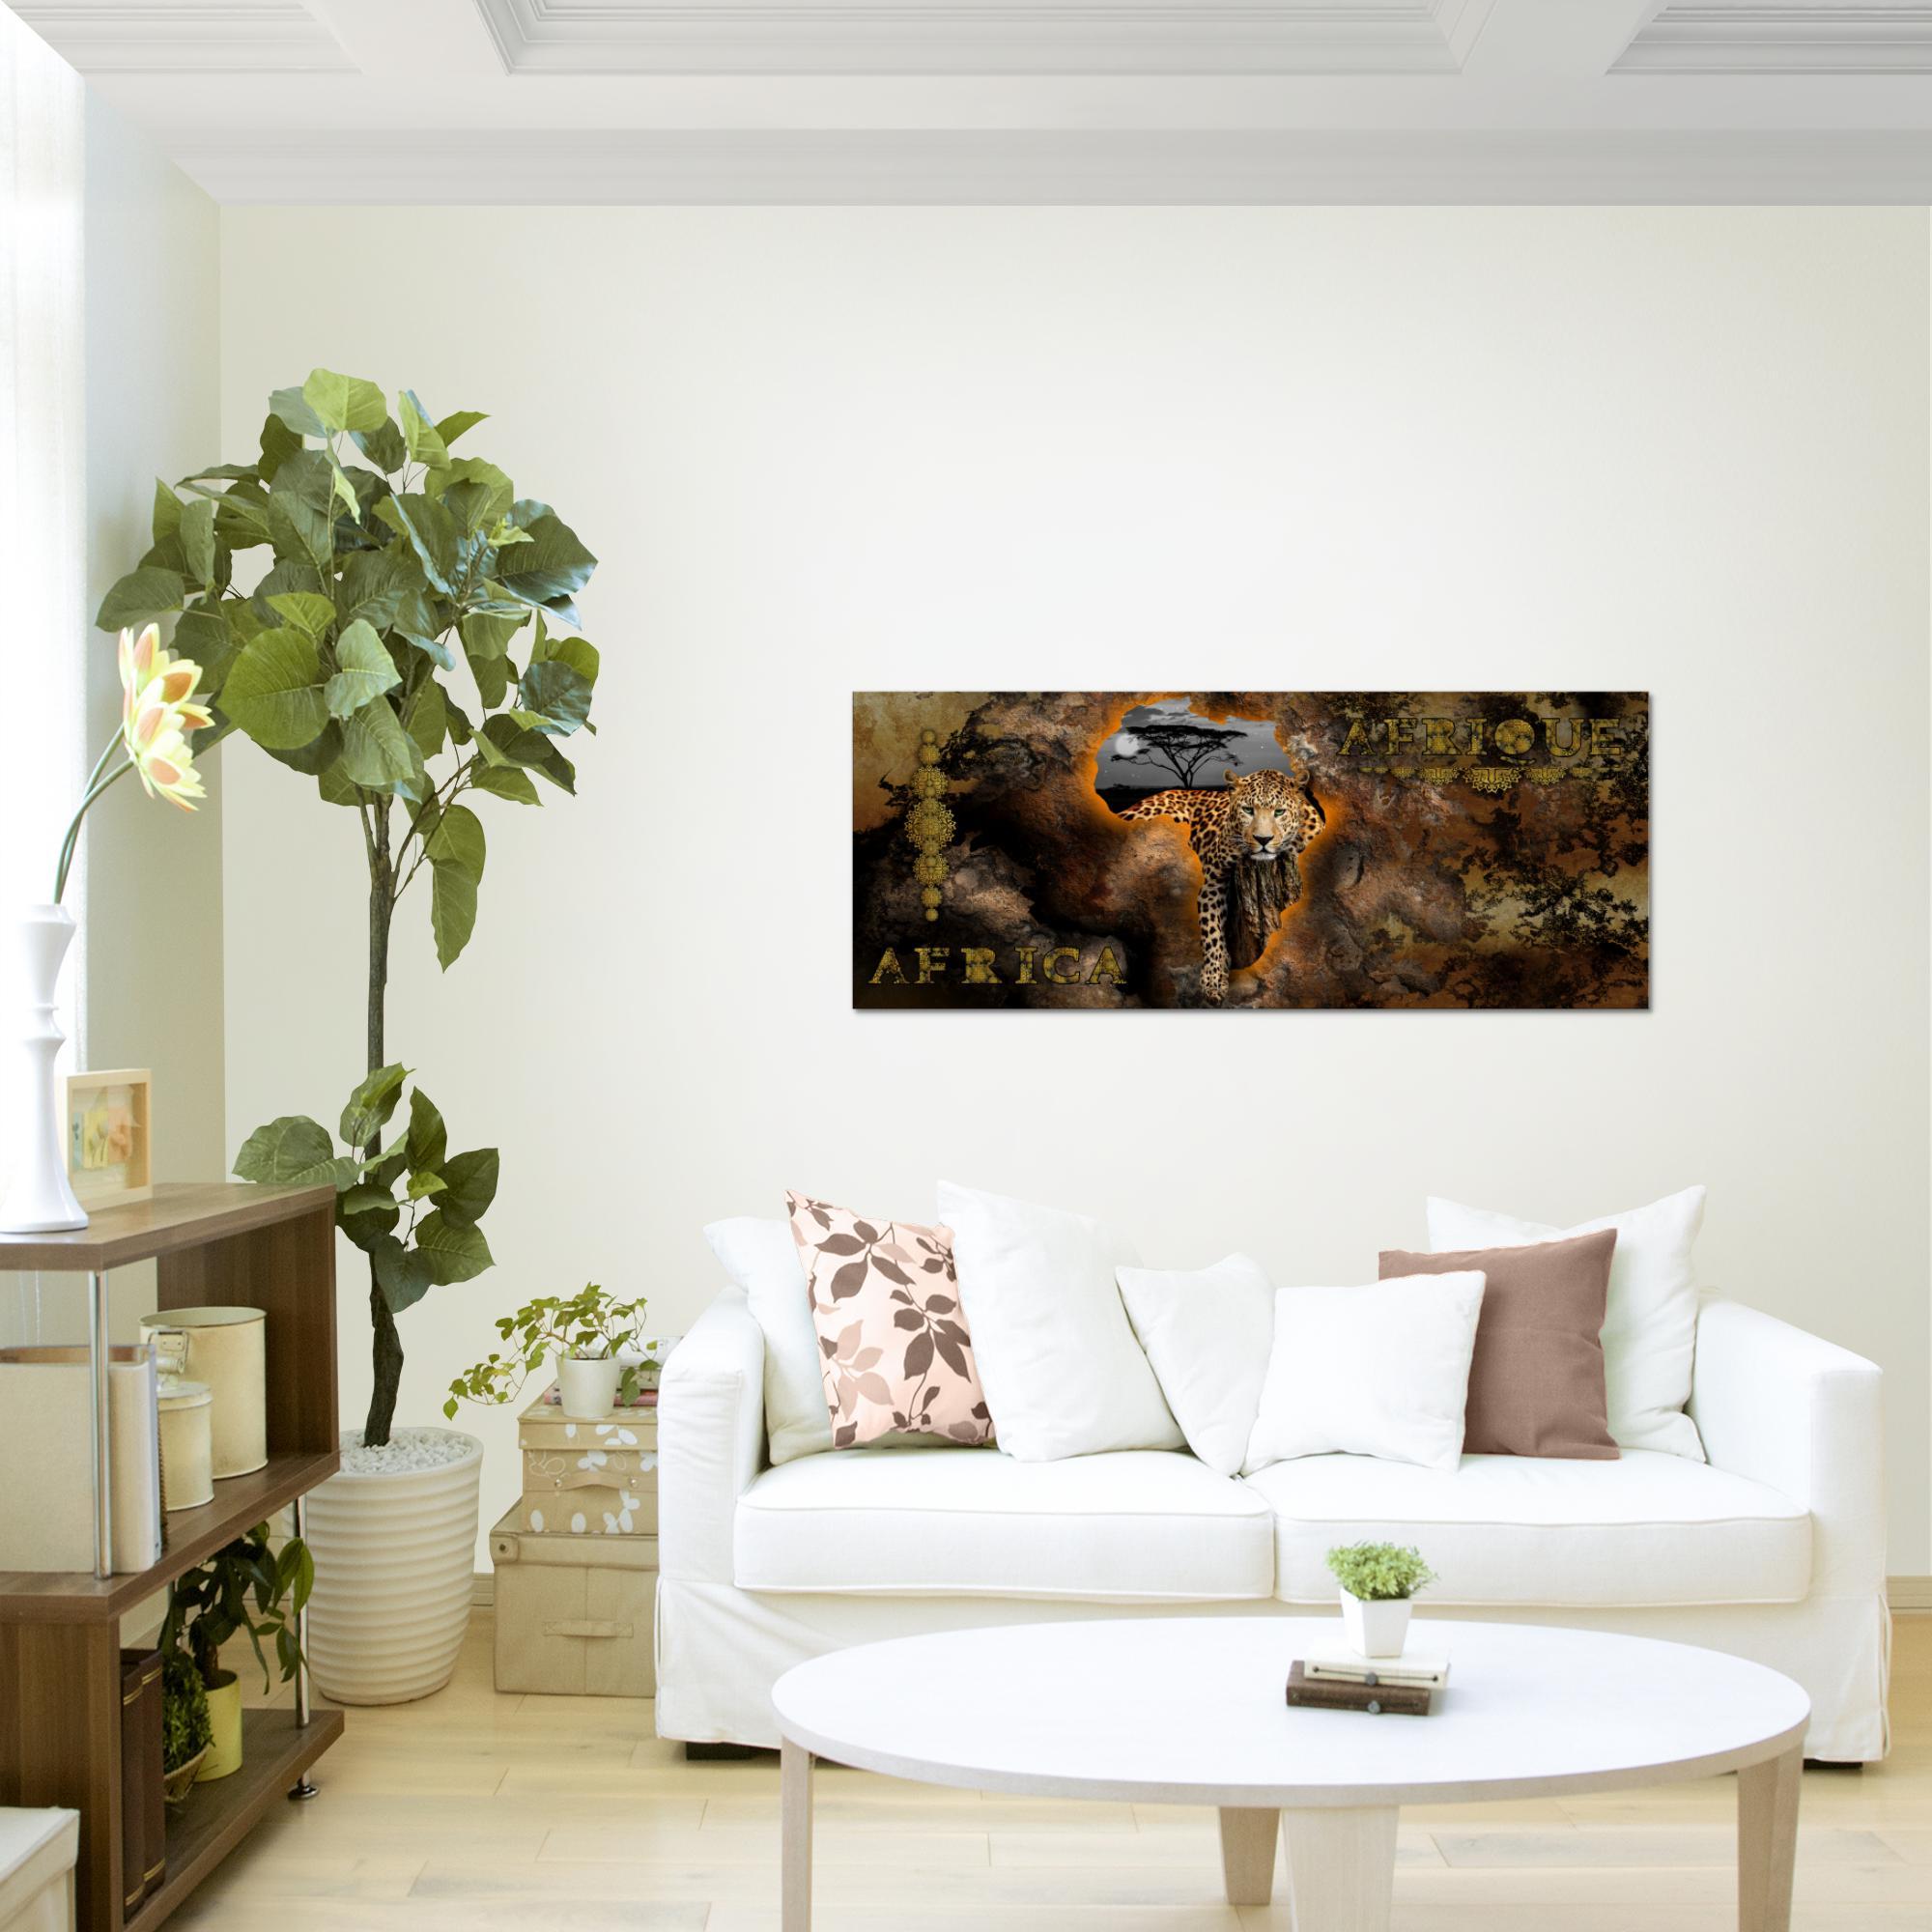 Afrika bild kunstdruck auf vlies leinwand xxl dekoration 022612p - Dekoration afrika ...